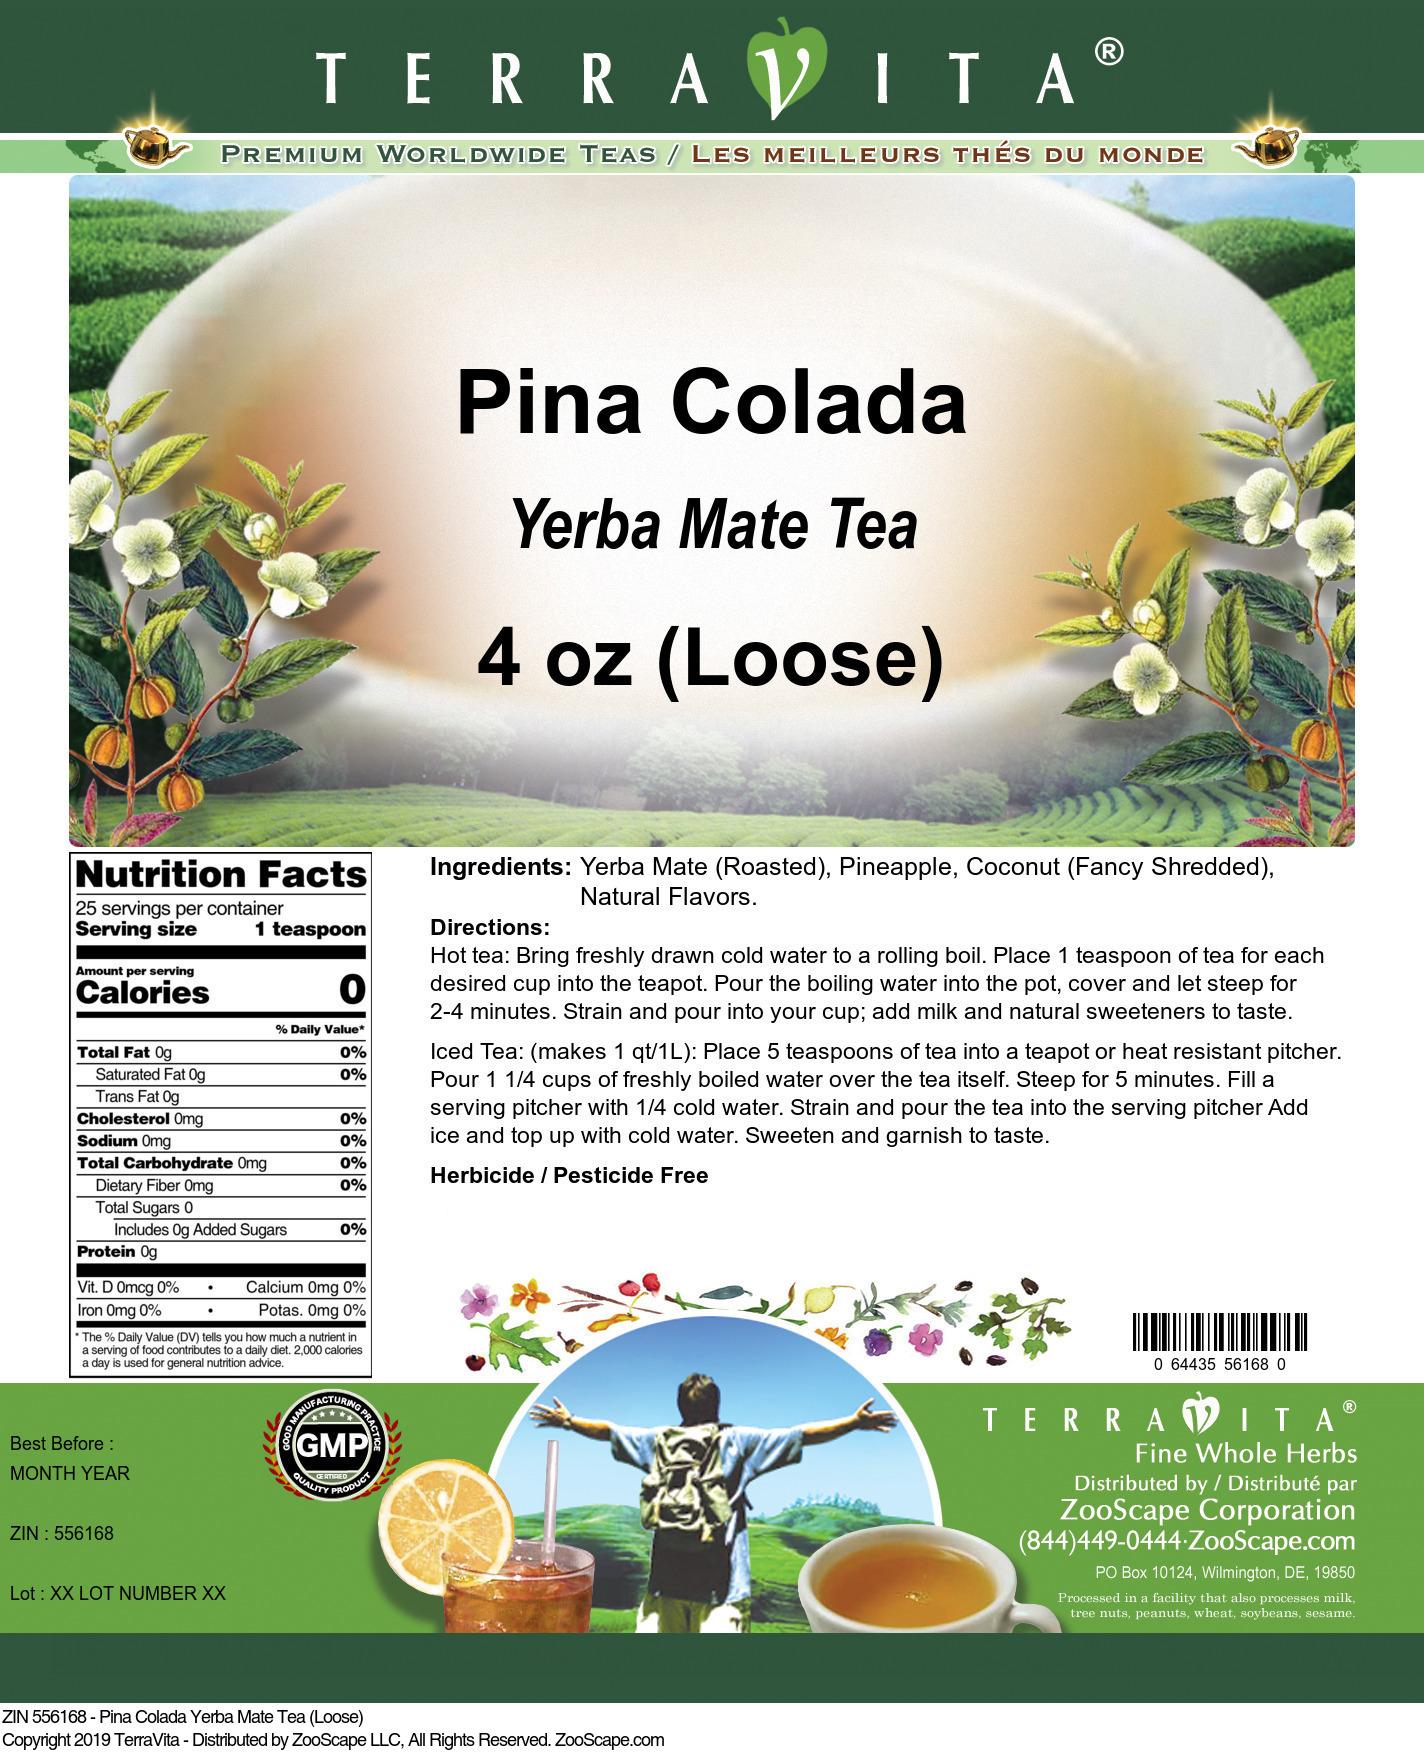 Pina Colada Yerba Mate Tea (Loose)